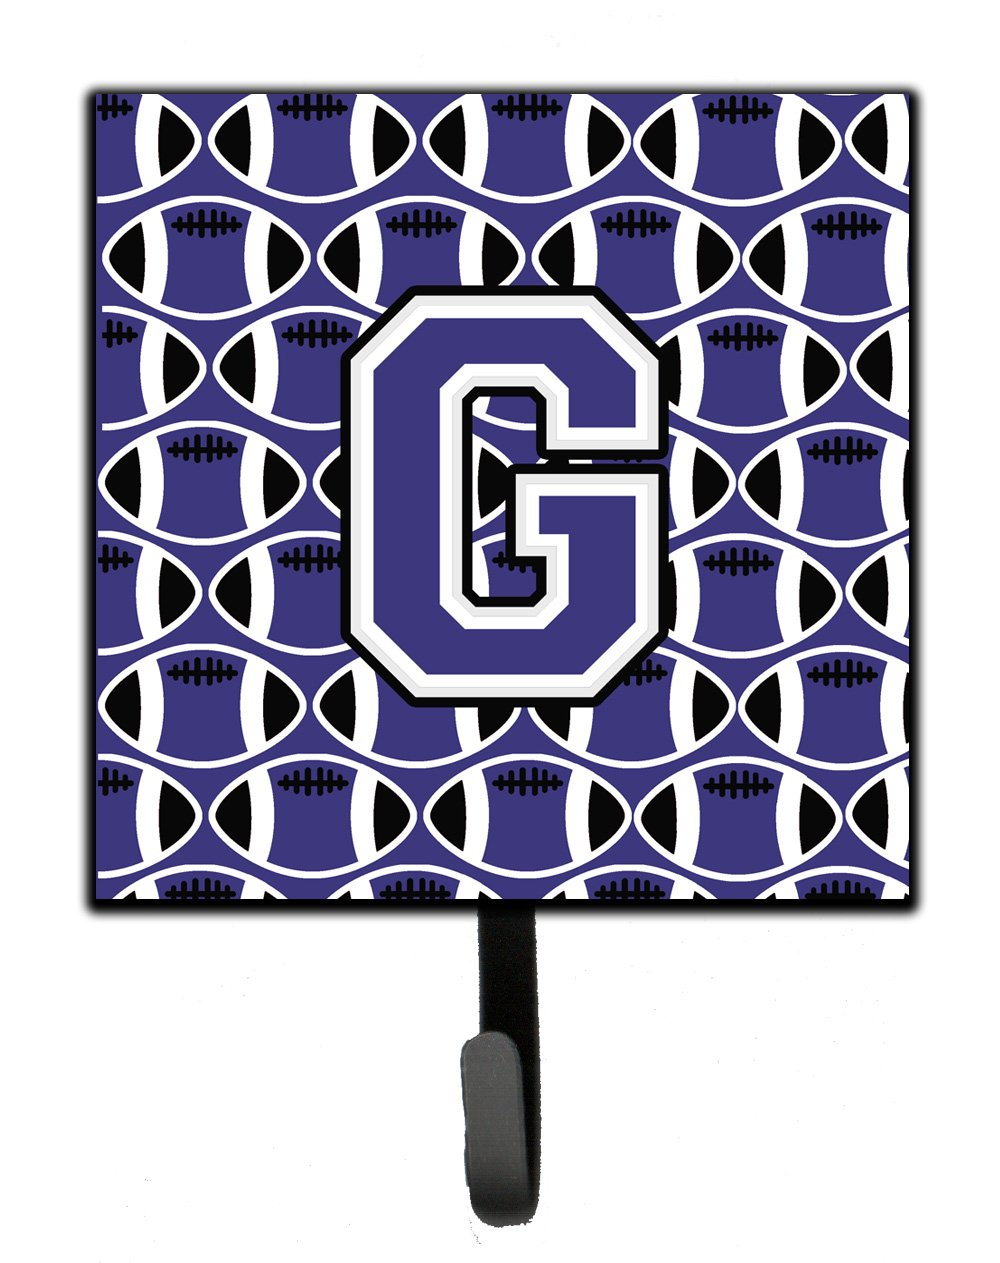 Carolines Treasures Letter G Football Purple and White Leash or Key Holder CJ1068-GSH4 Small Multicolor